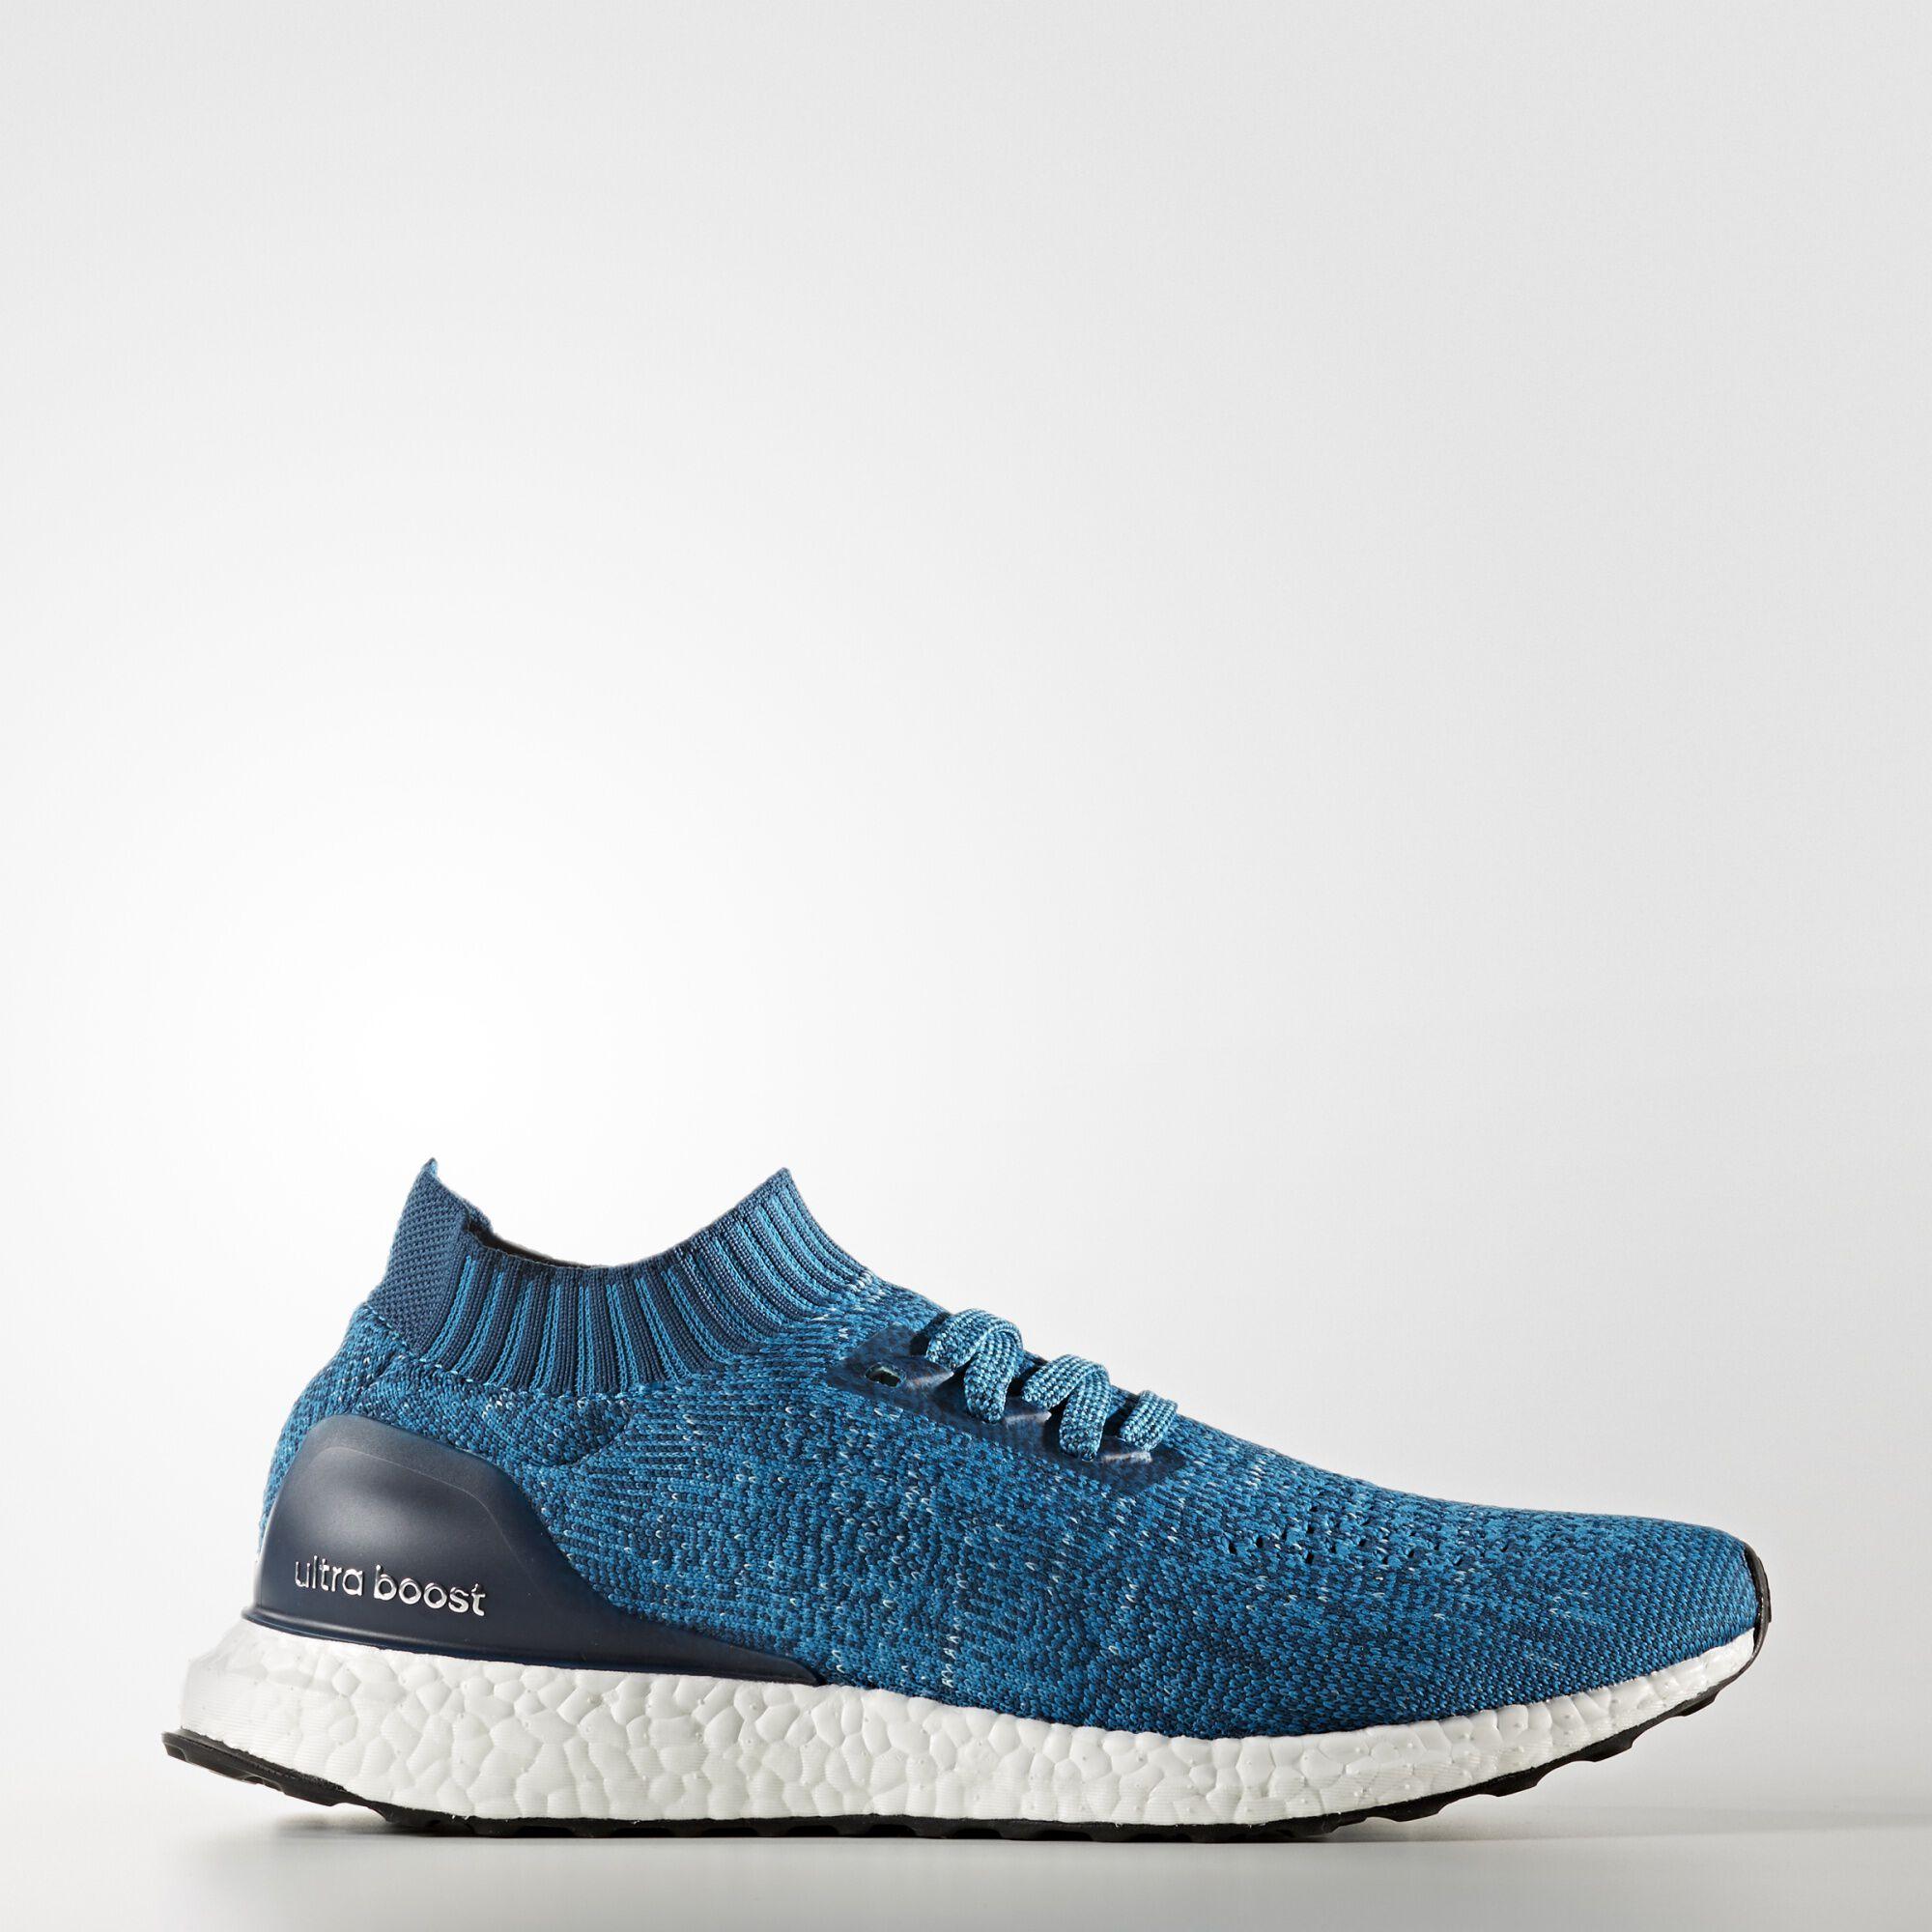 online retailer 10a8b 60b5d ... nike lunarepic flyknit pantip Mens Running Shoes UltraBOOST,  Alphabounce and More adidas ...